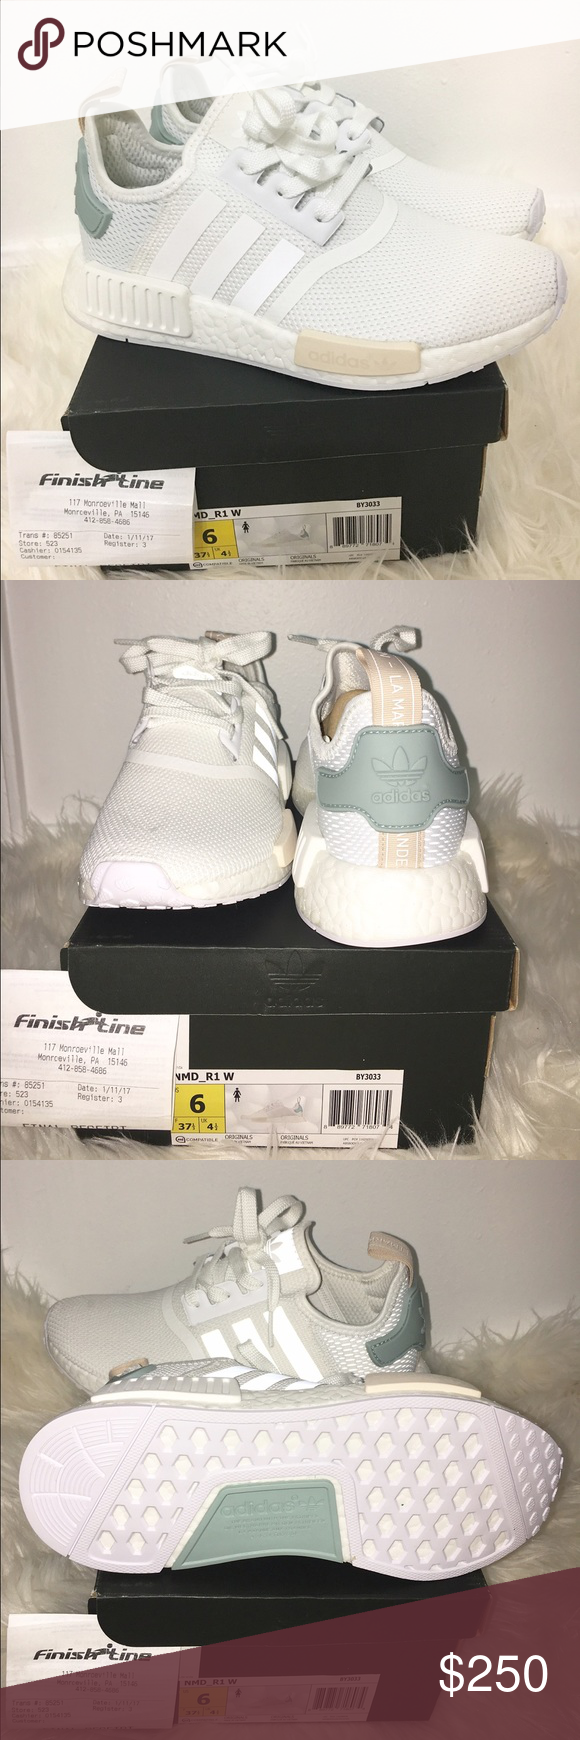 adidas gazelle women talc white adidas nmd r1 women size 6